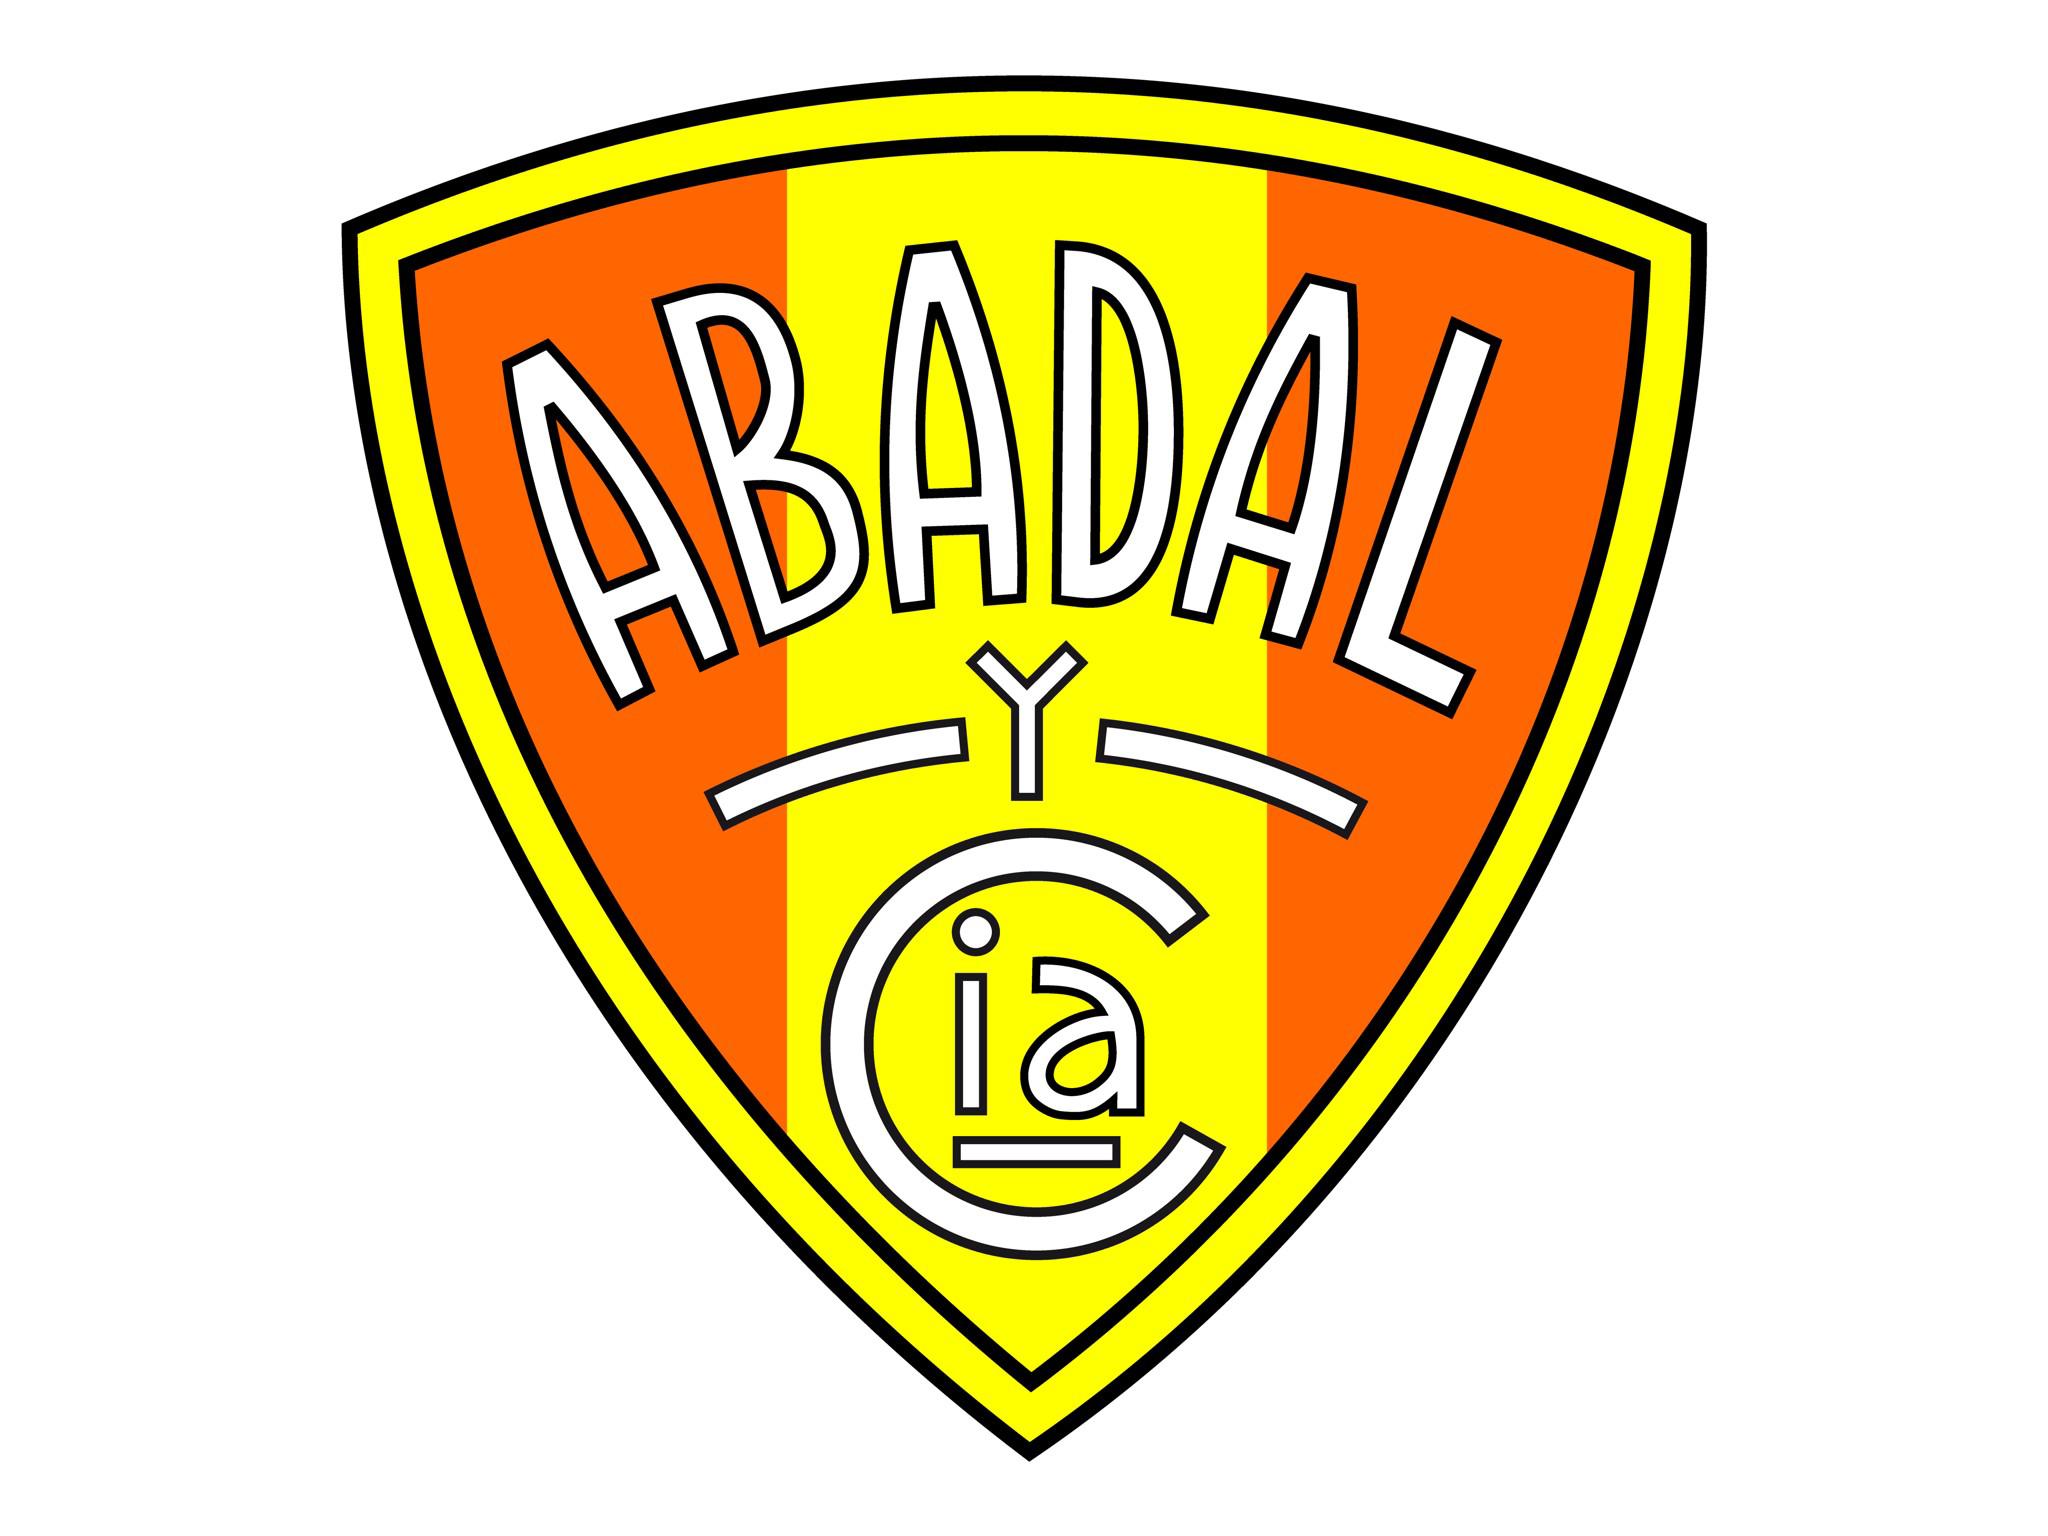 Abadal Logo Wallpaper